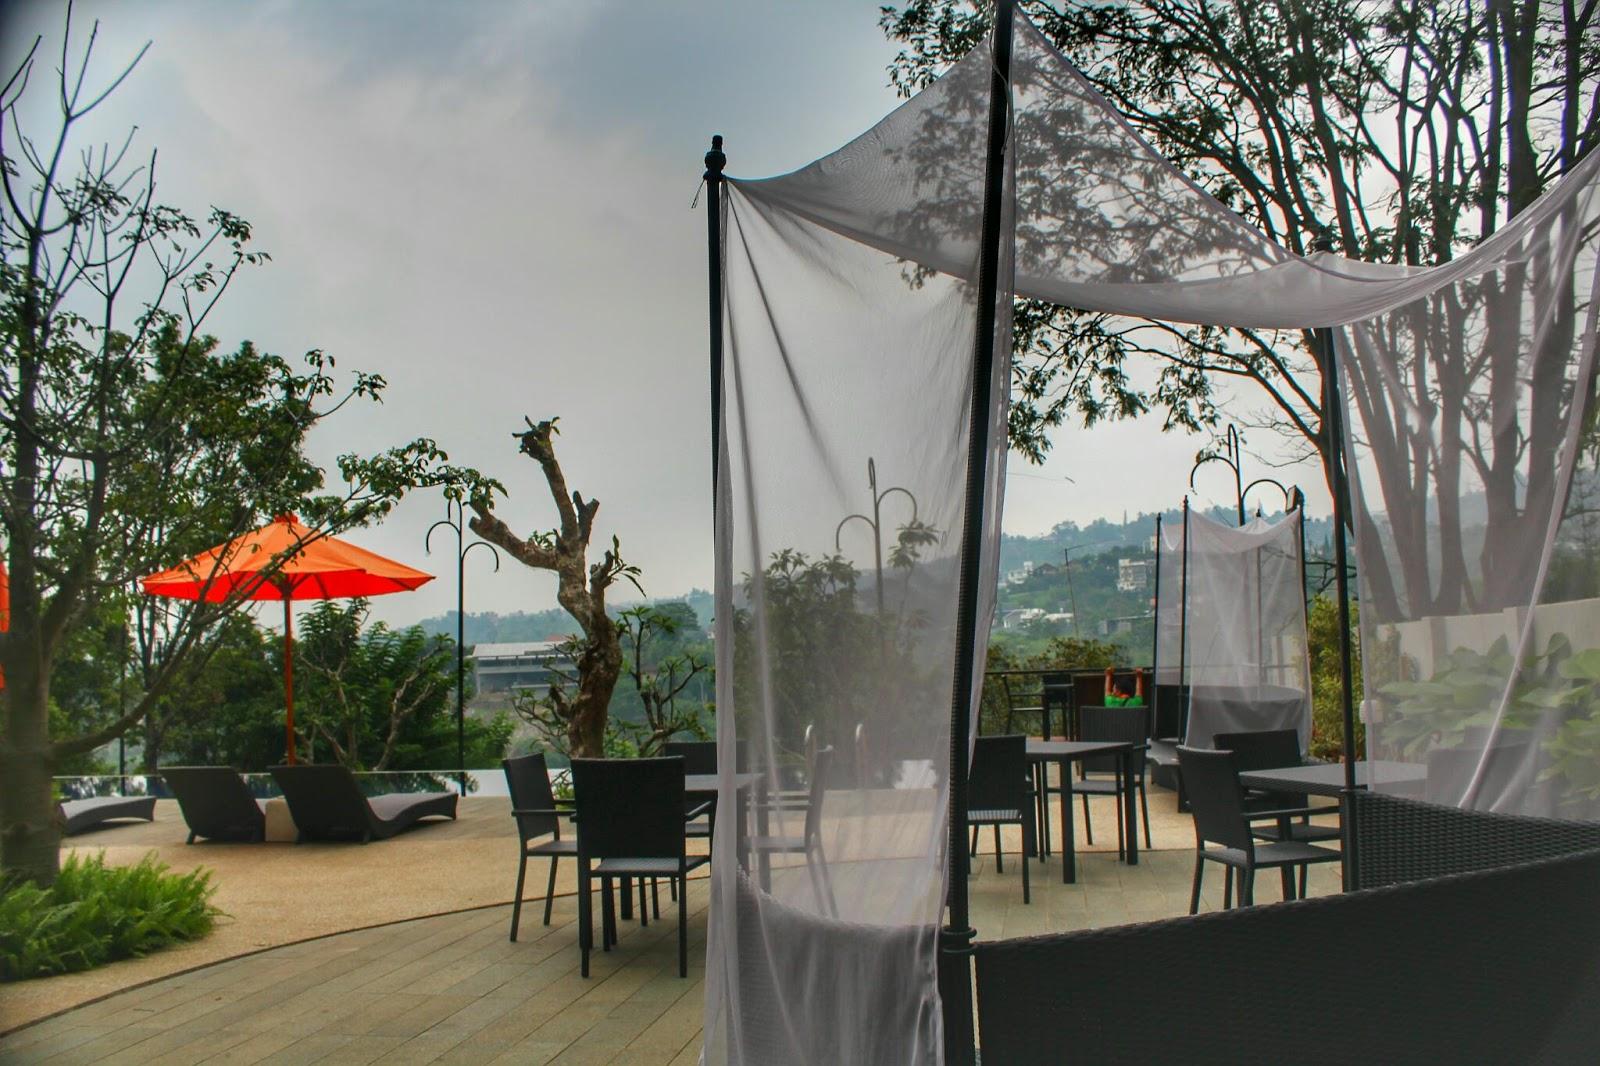 Clove Garden Hotel Residence Bandung Hotel Romantis Dengan View